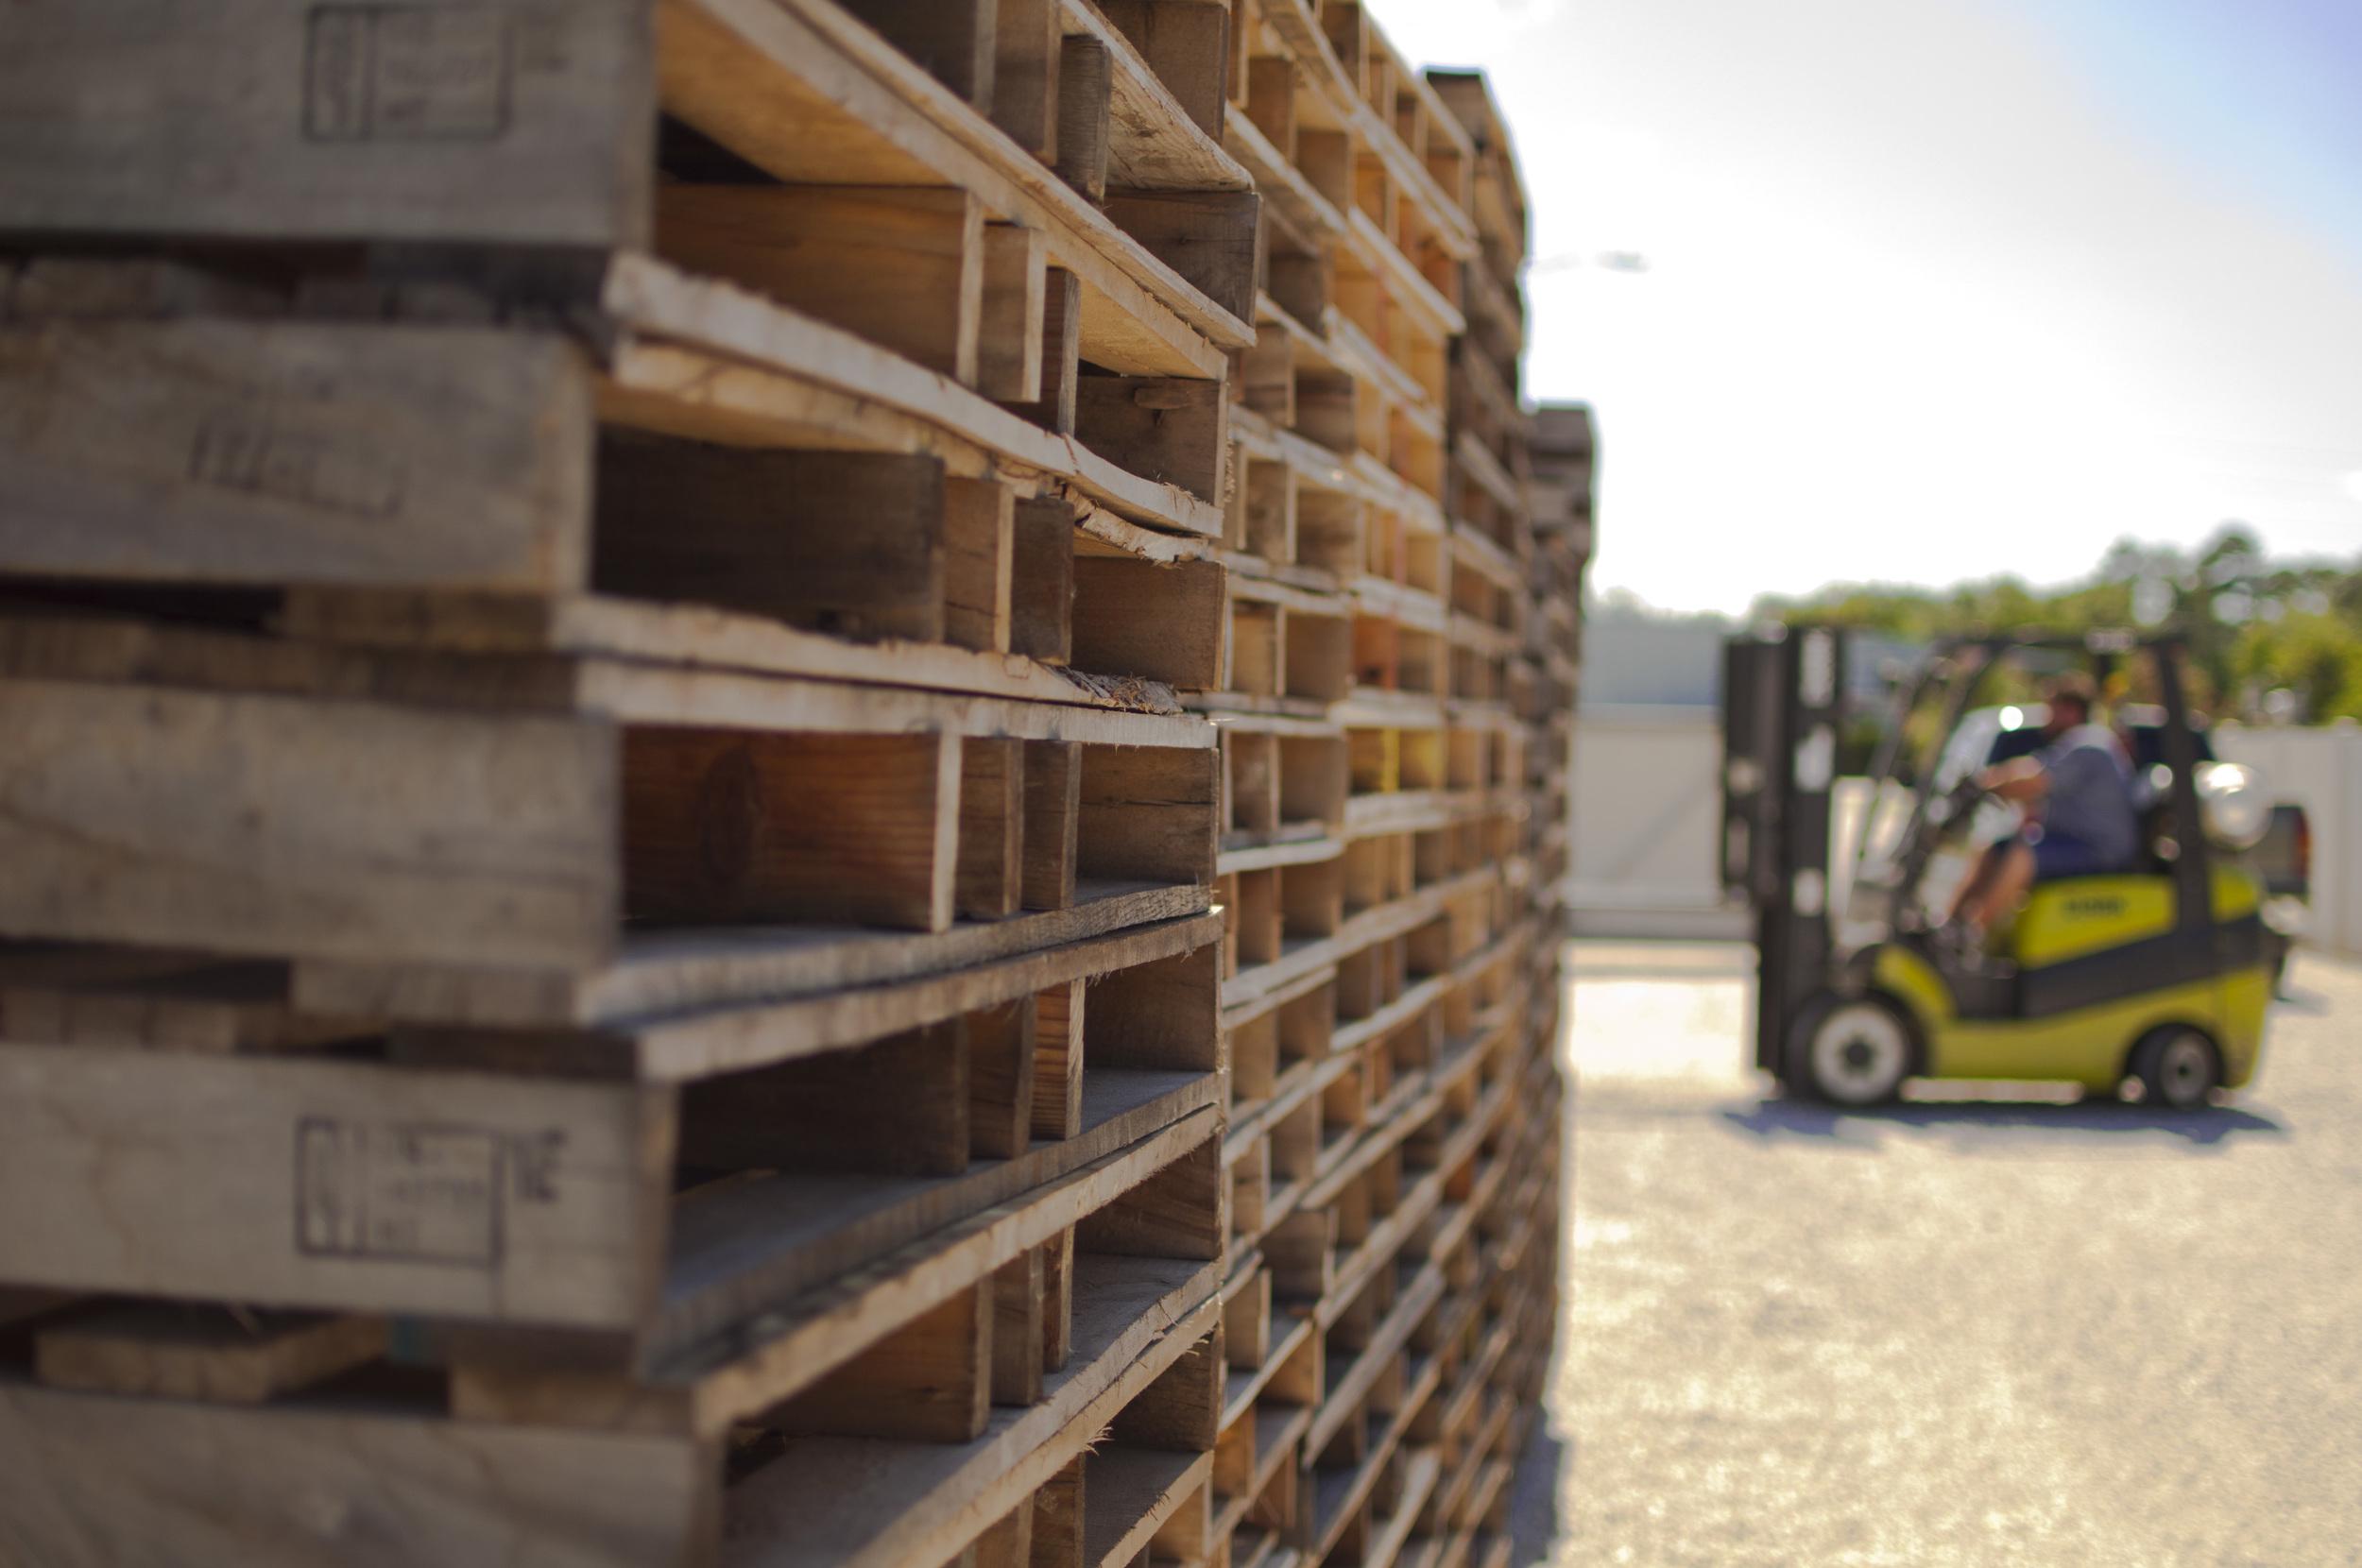 Pallets and Forklift.jpg